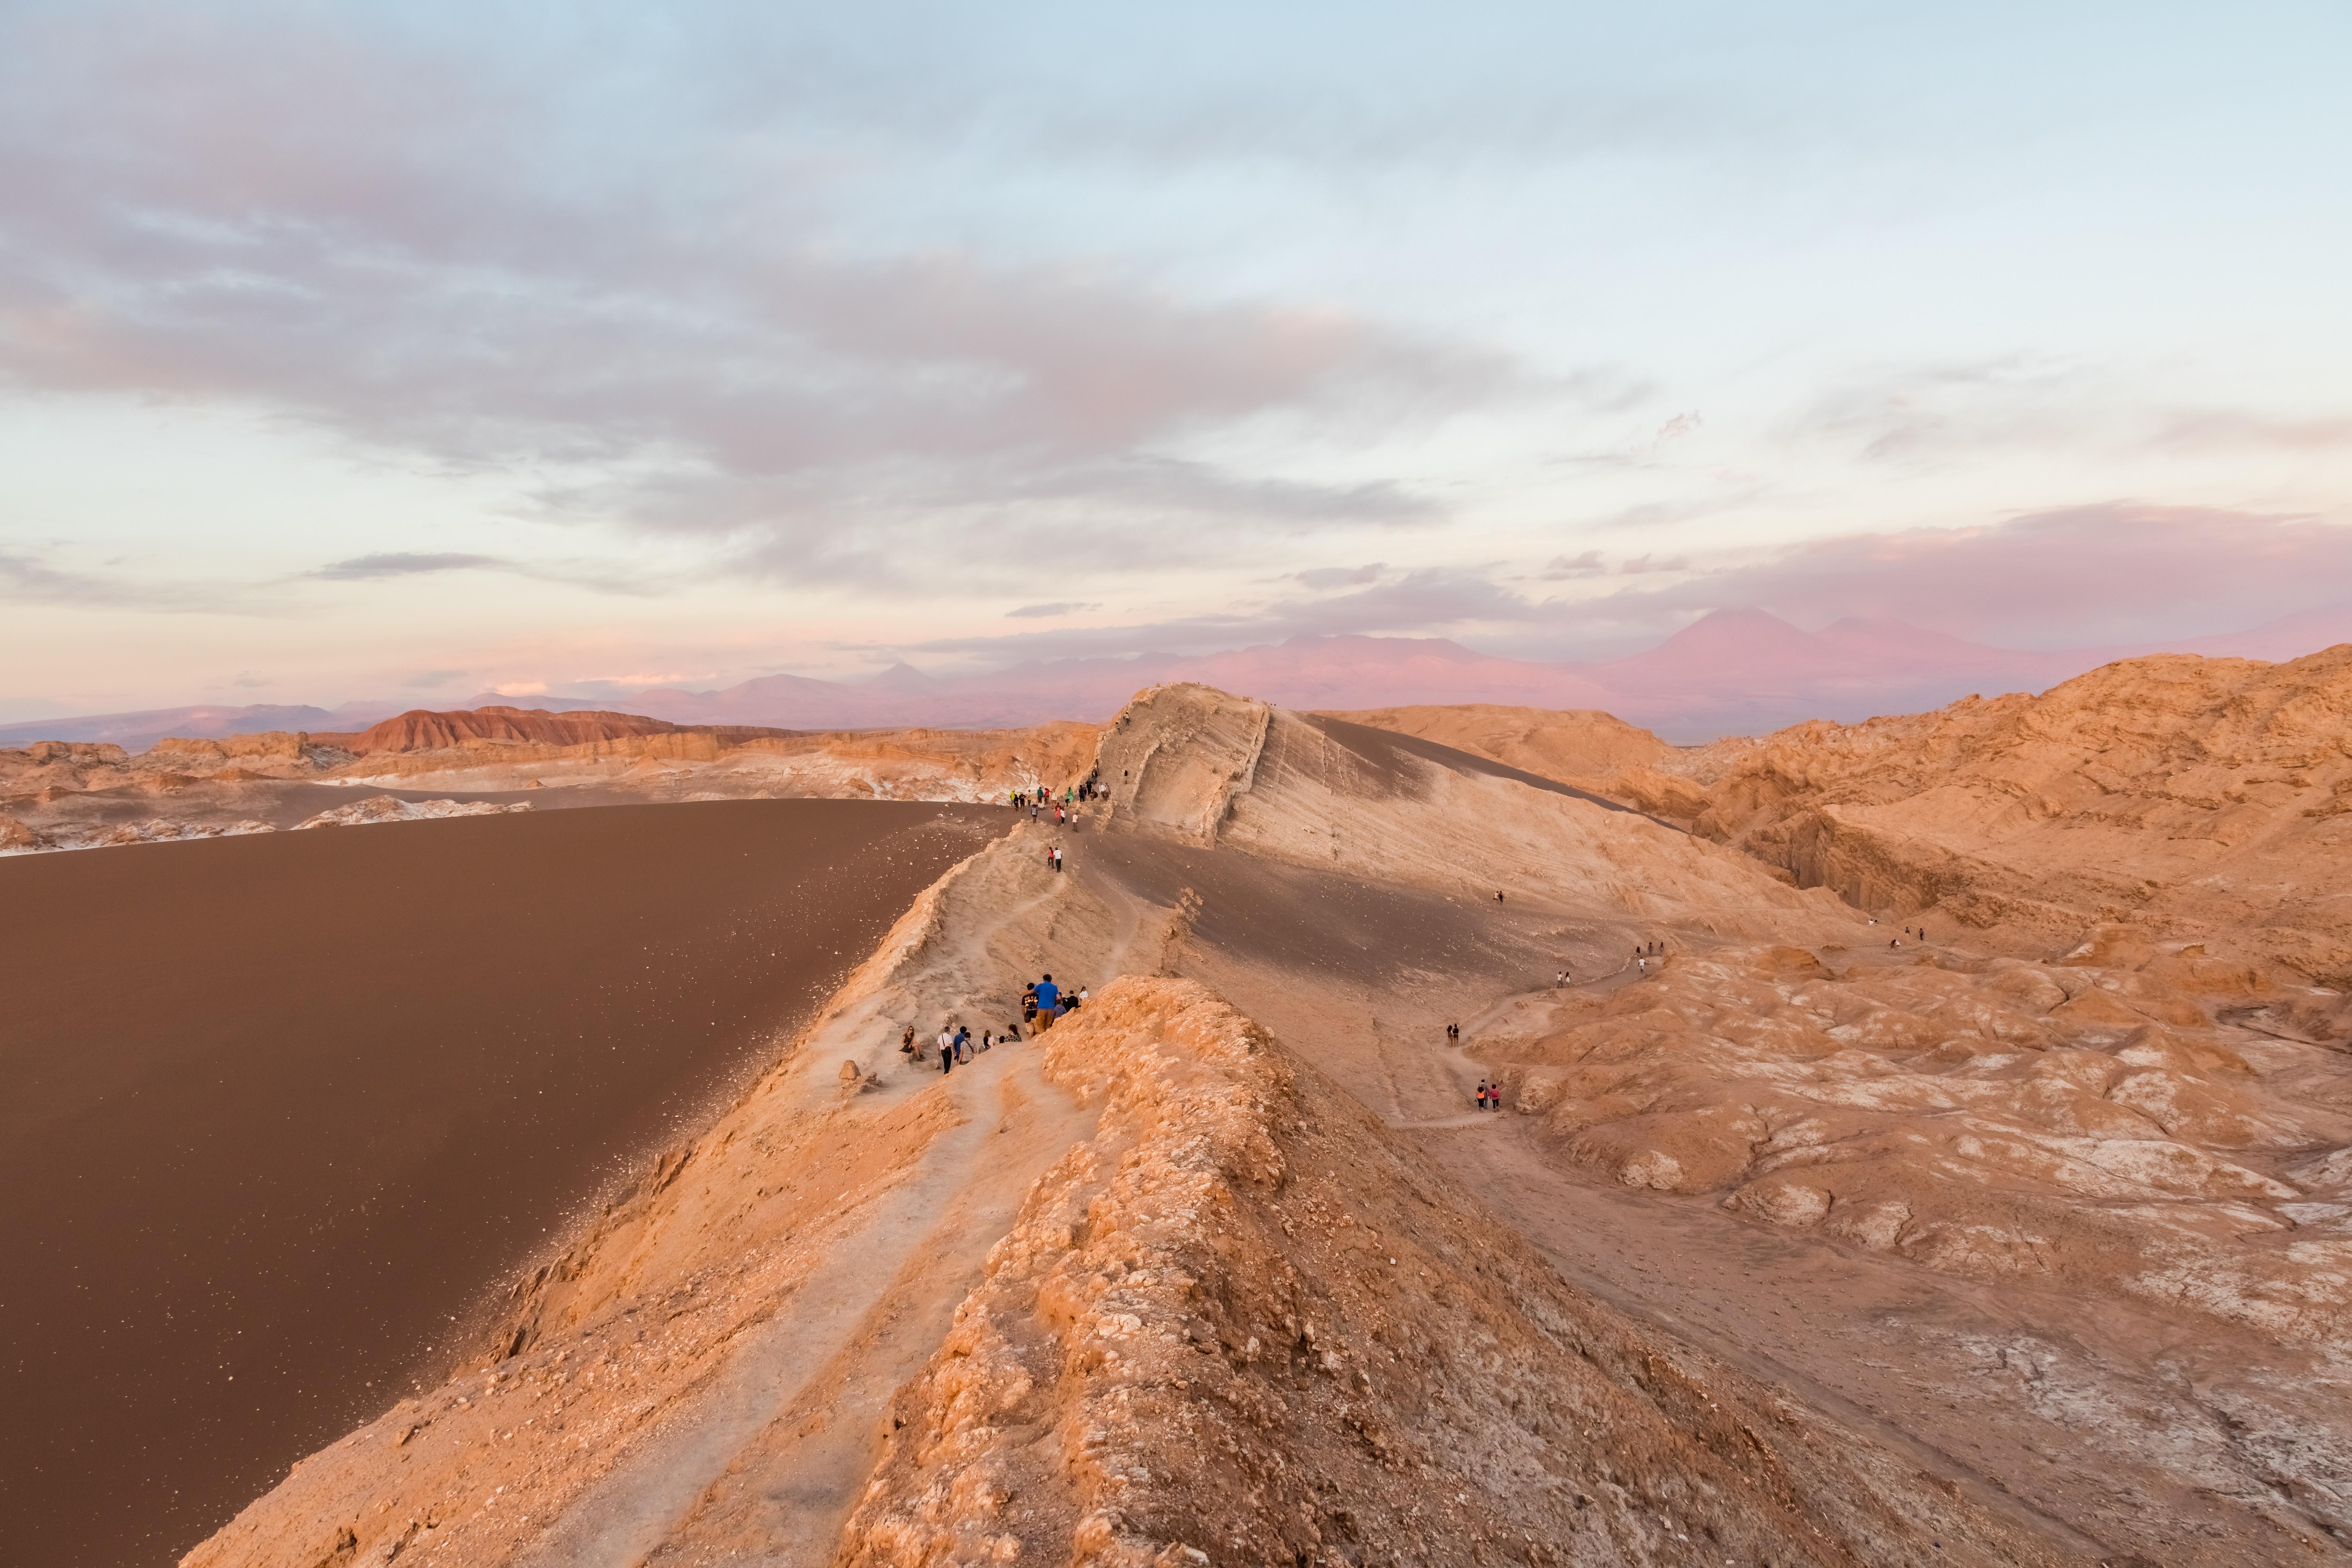 File:Valle de la Luna, San Pedro de Atacama, Chile, 2016 ...